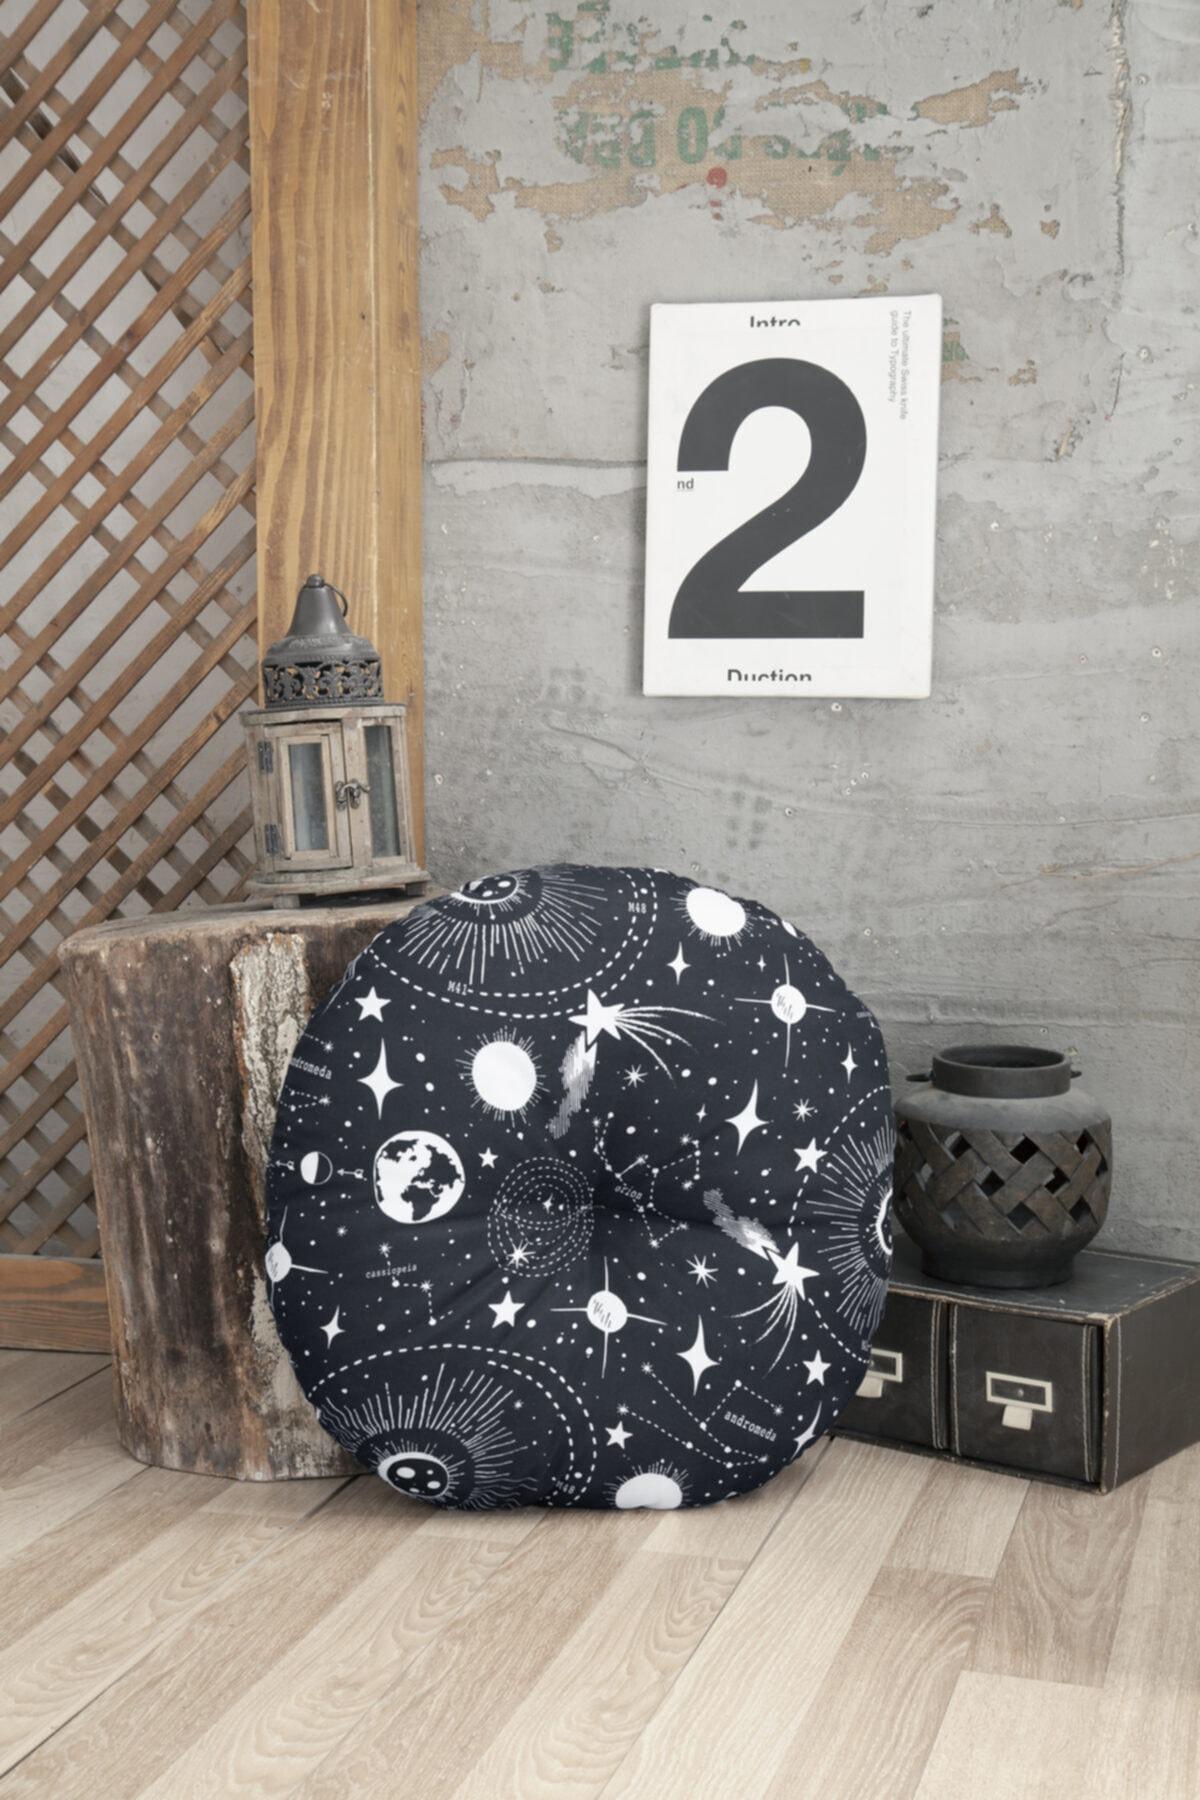 Home&Bath Dekoratif Yer Minderi Andromeda 1